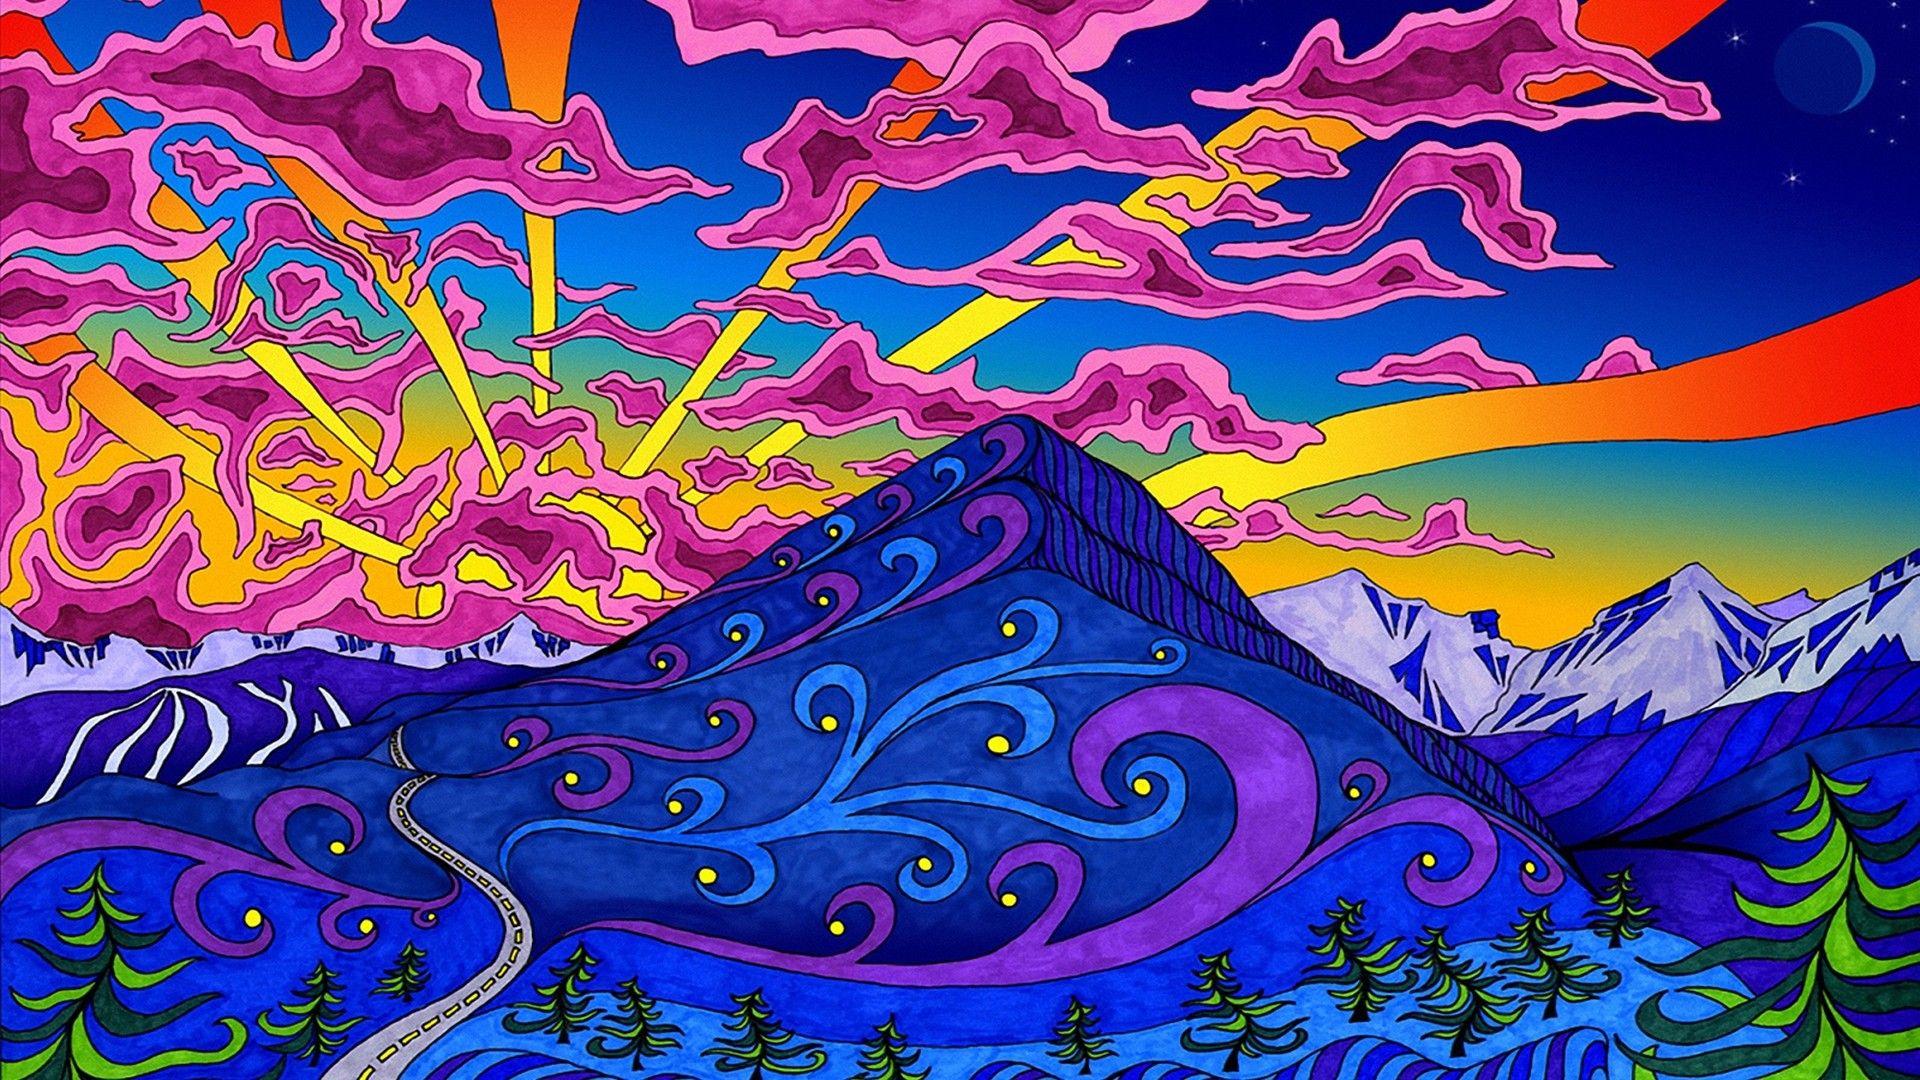 sky wallpaper 4k